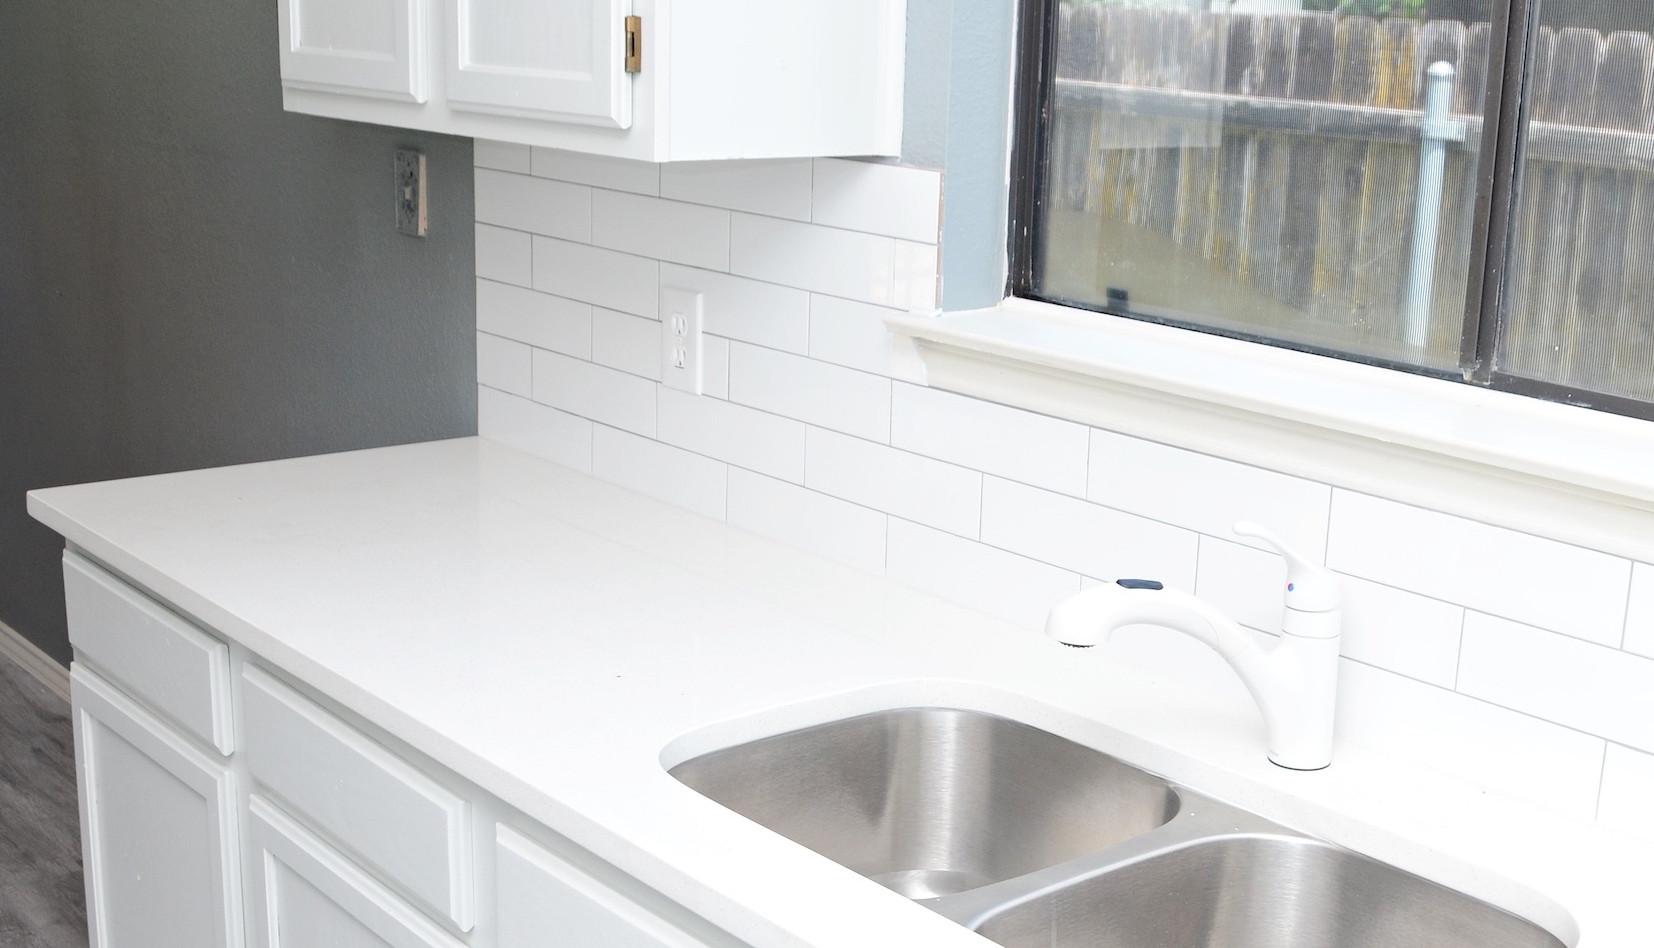 kitchen_remodel_6.JPG